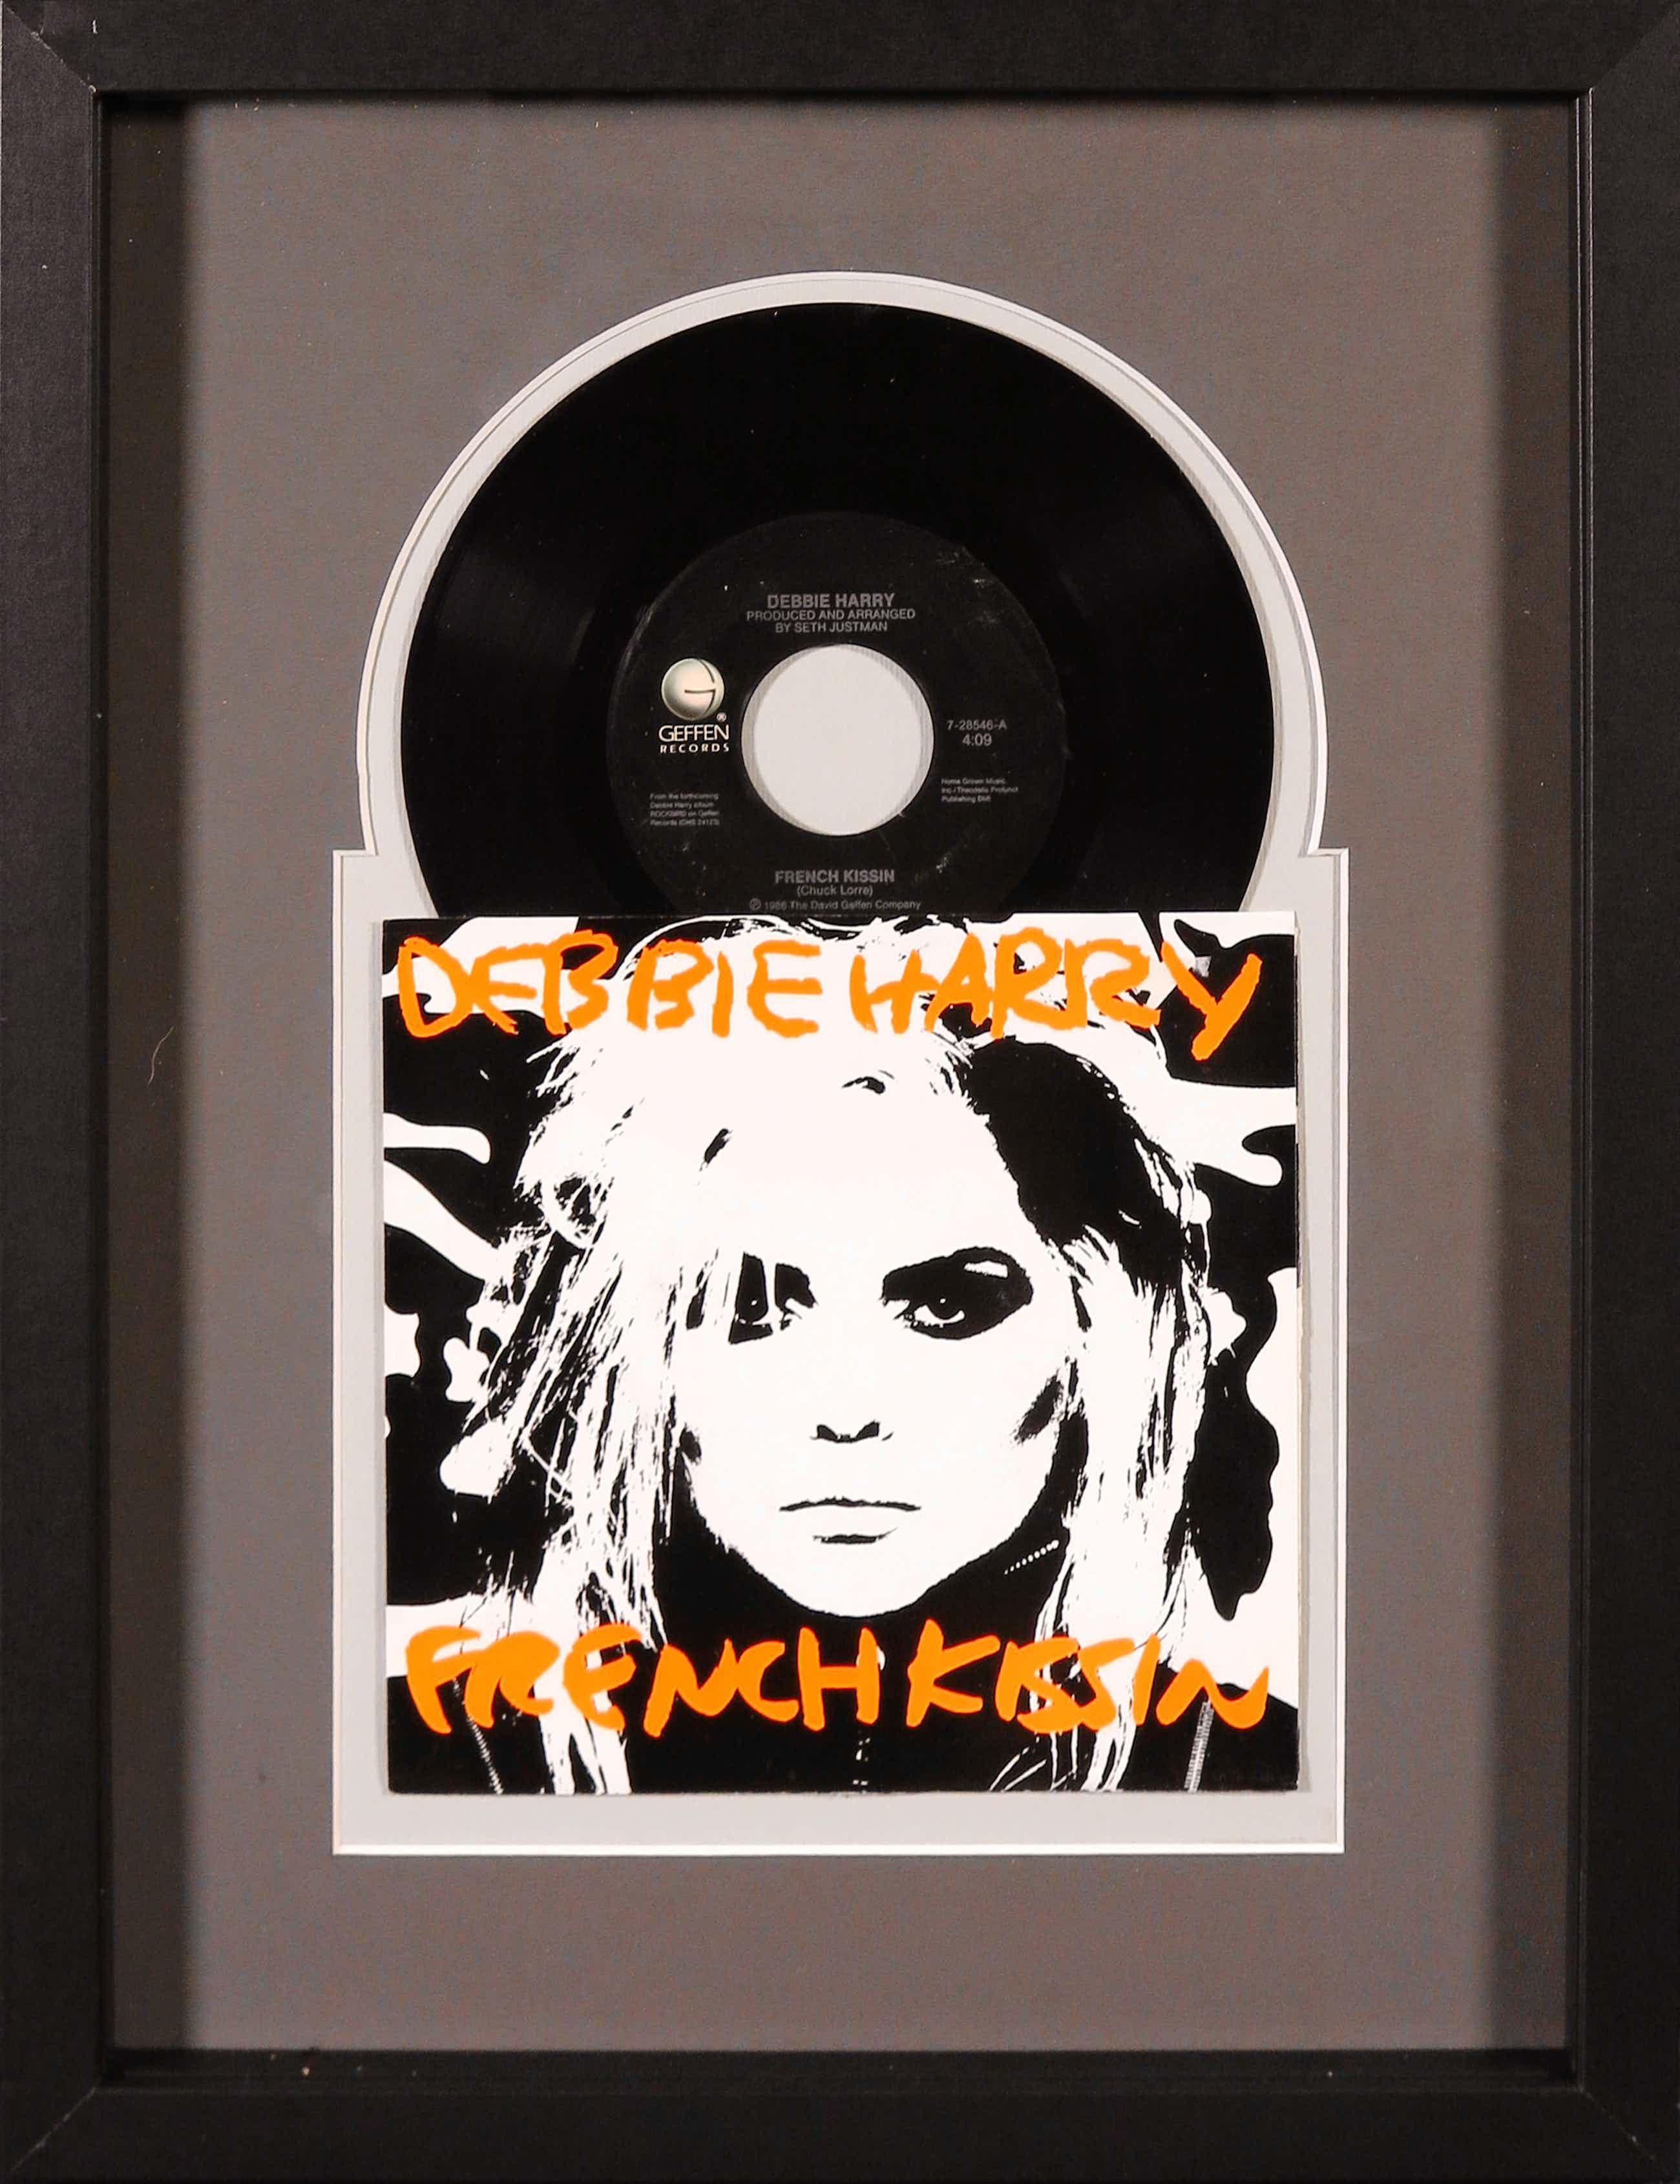 Andy Warhol - French Kissin - Debbie Harry kopen? Bied vanaf 90!